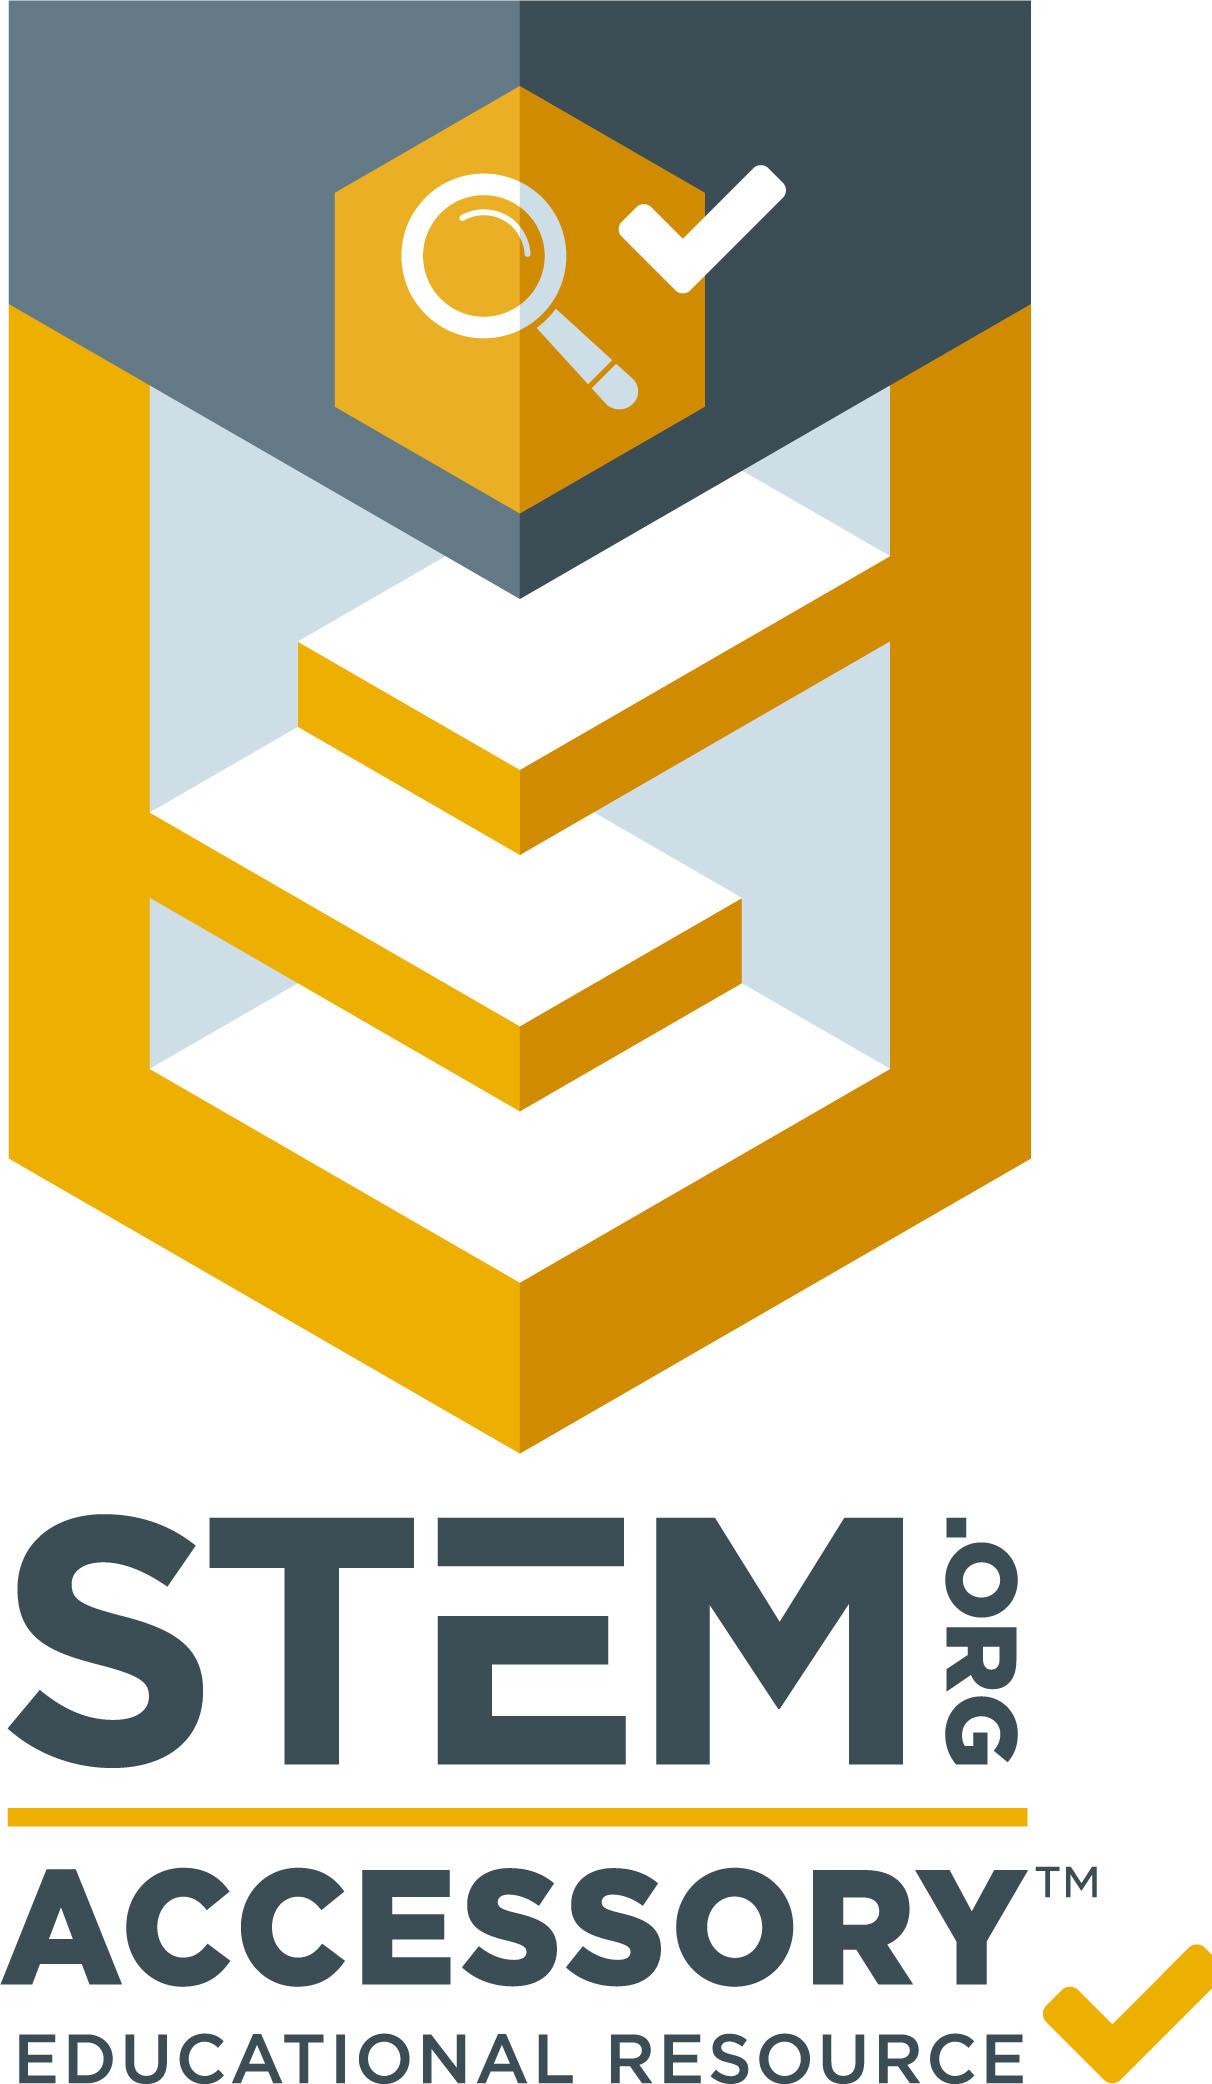 STEM Accessory